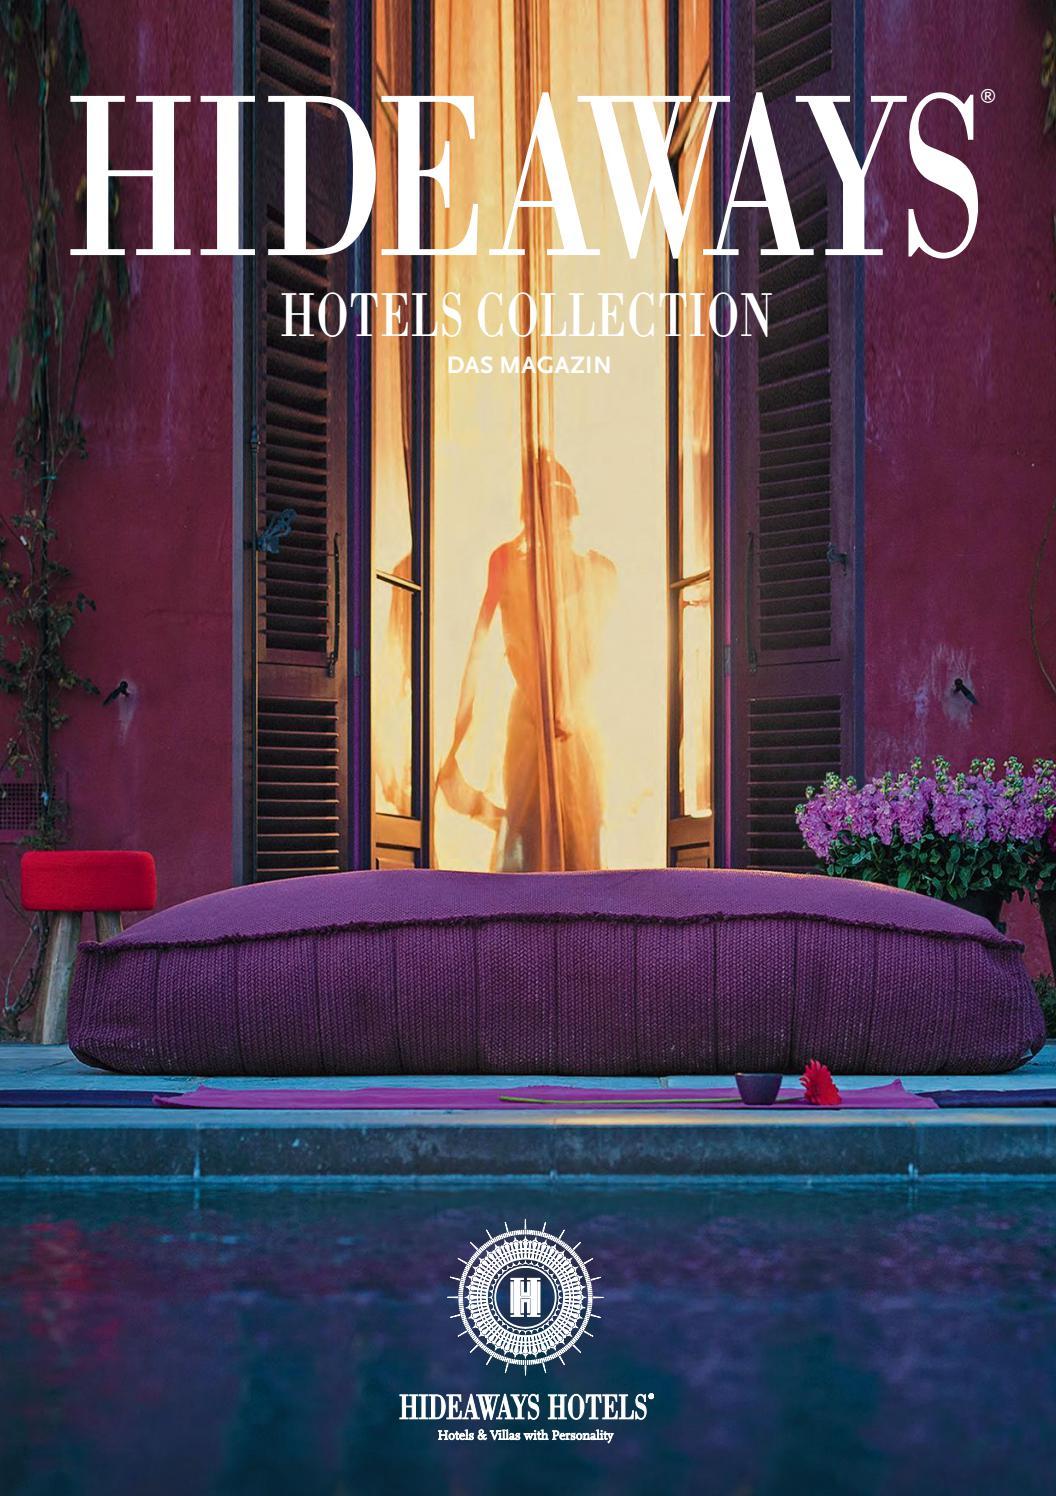 Hideaways Hotels Magazin 20 by Klocke Verlag   issuu